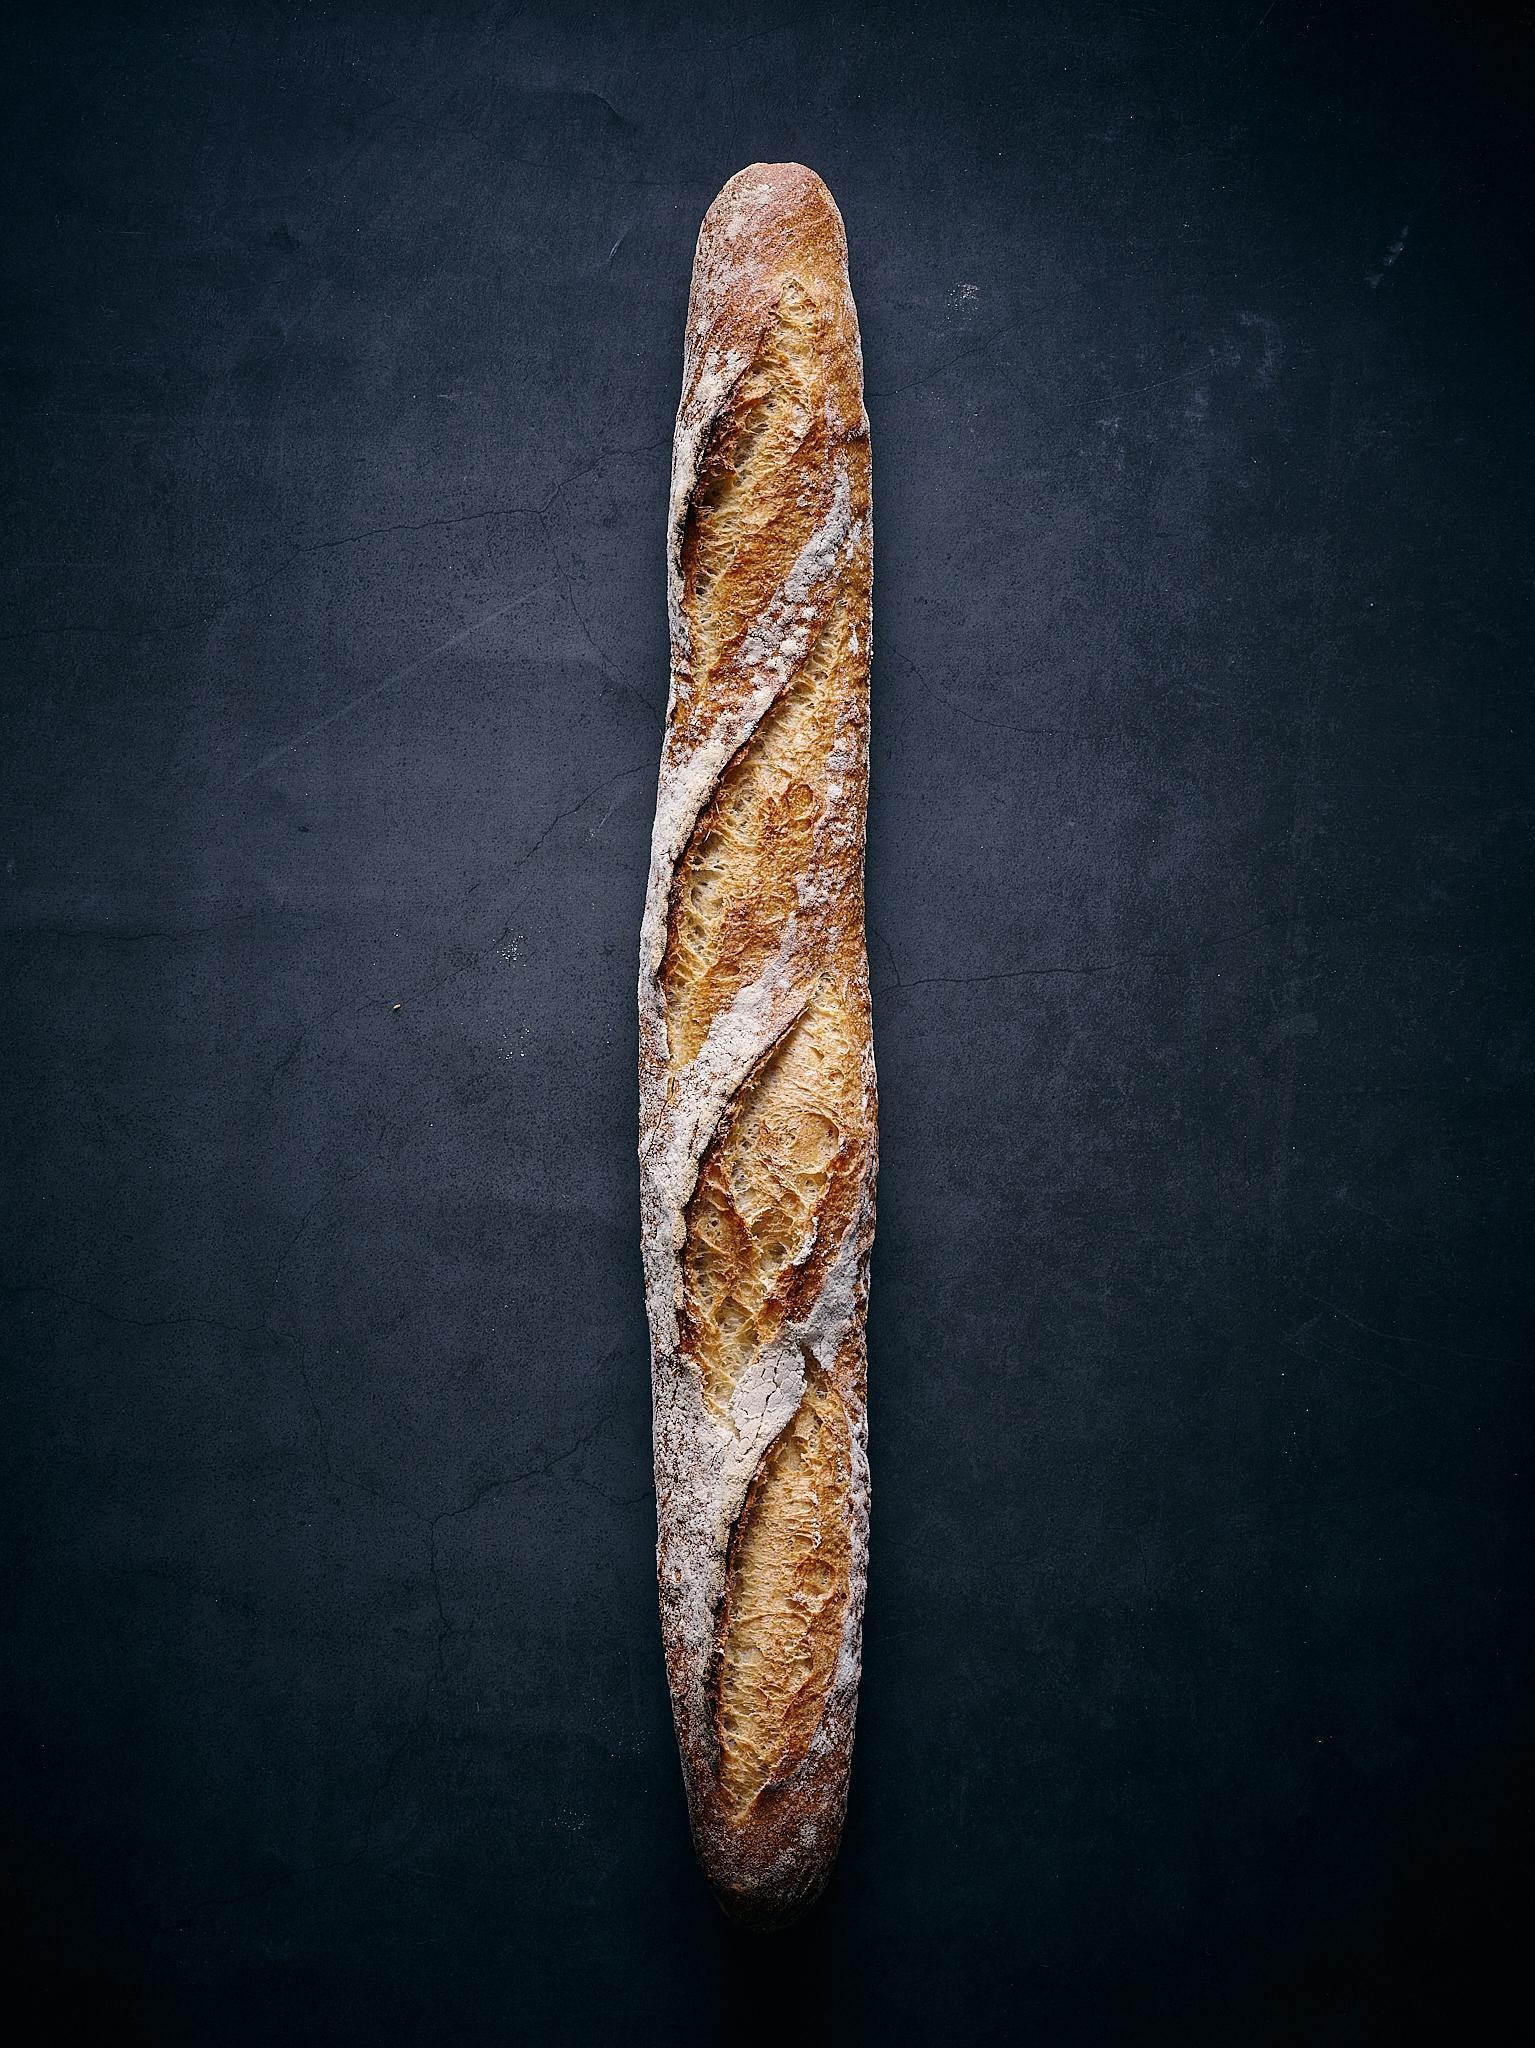 Photographie culinaire boulangerie